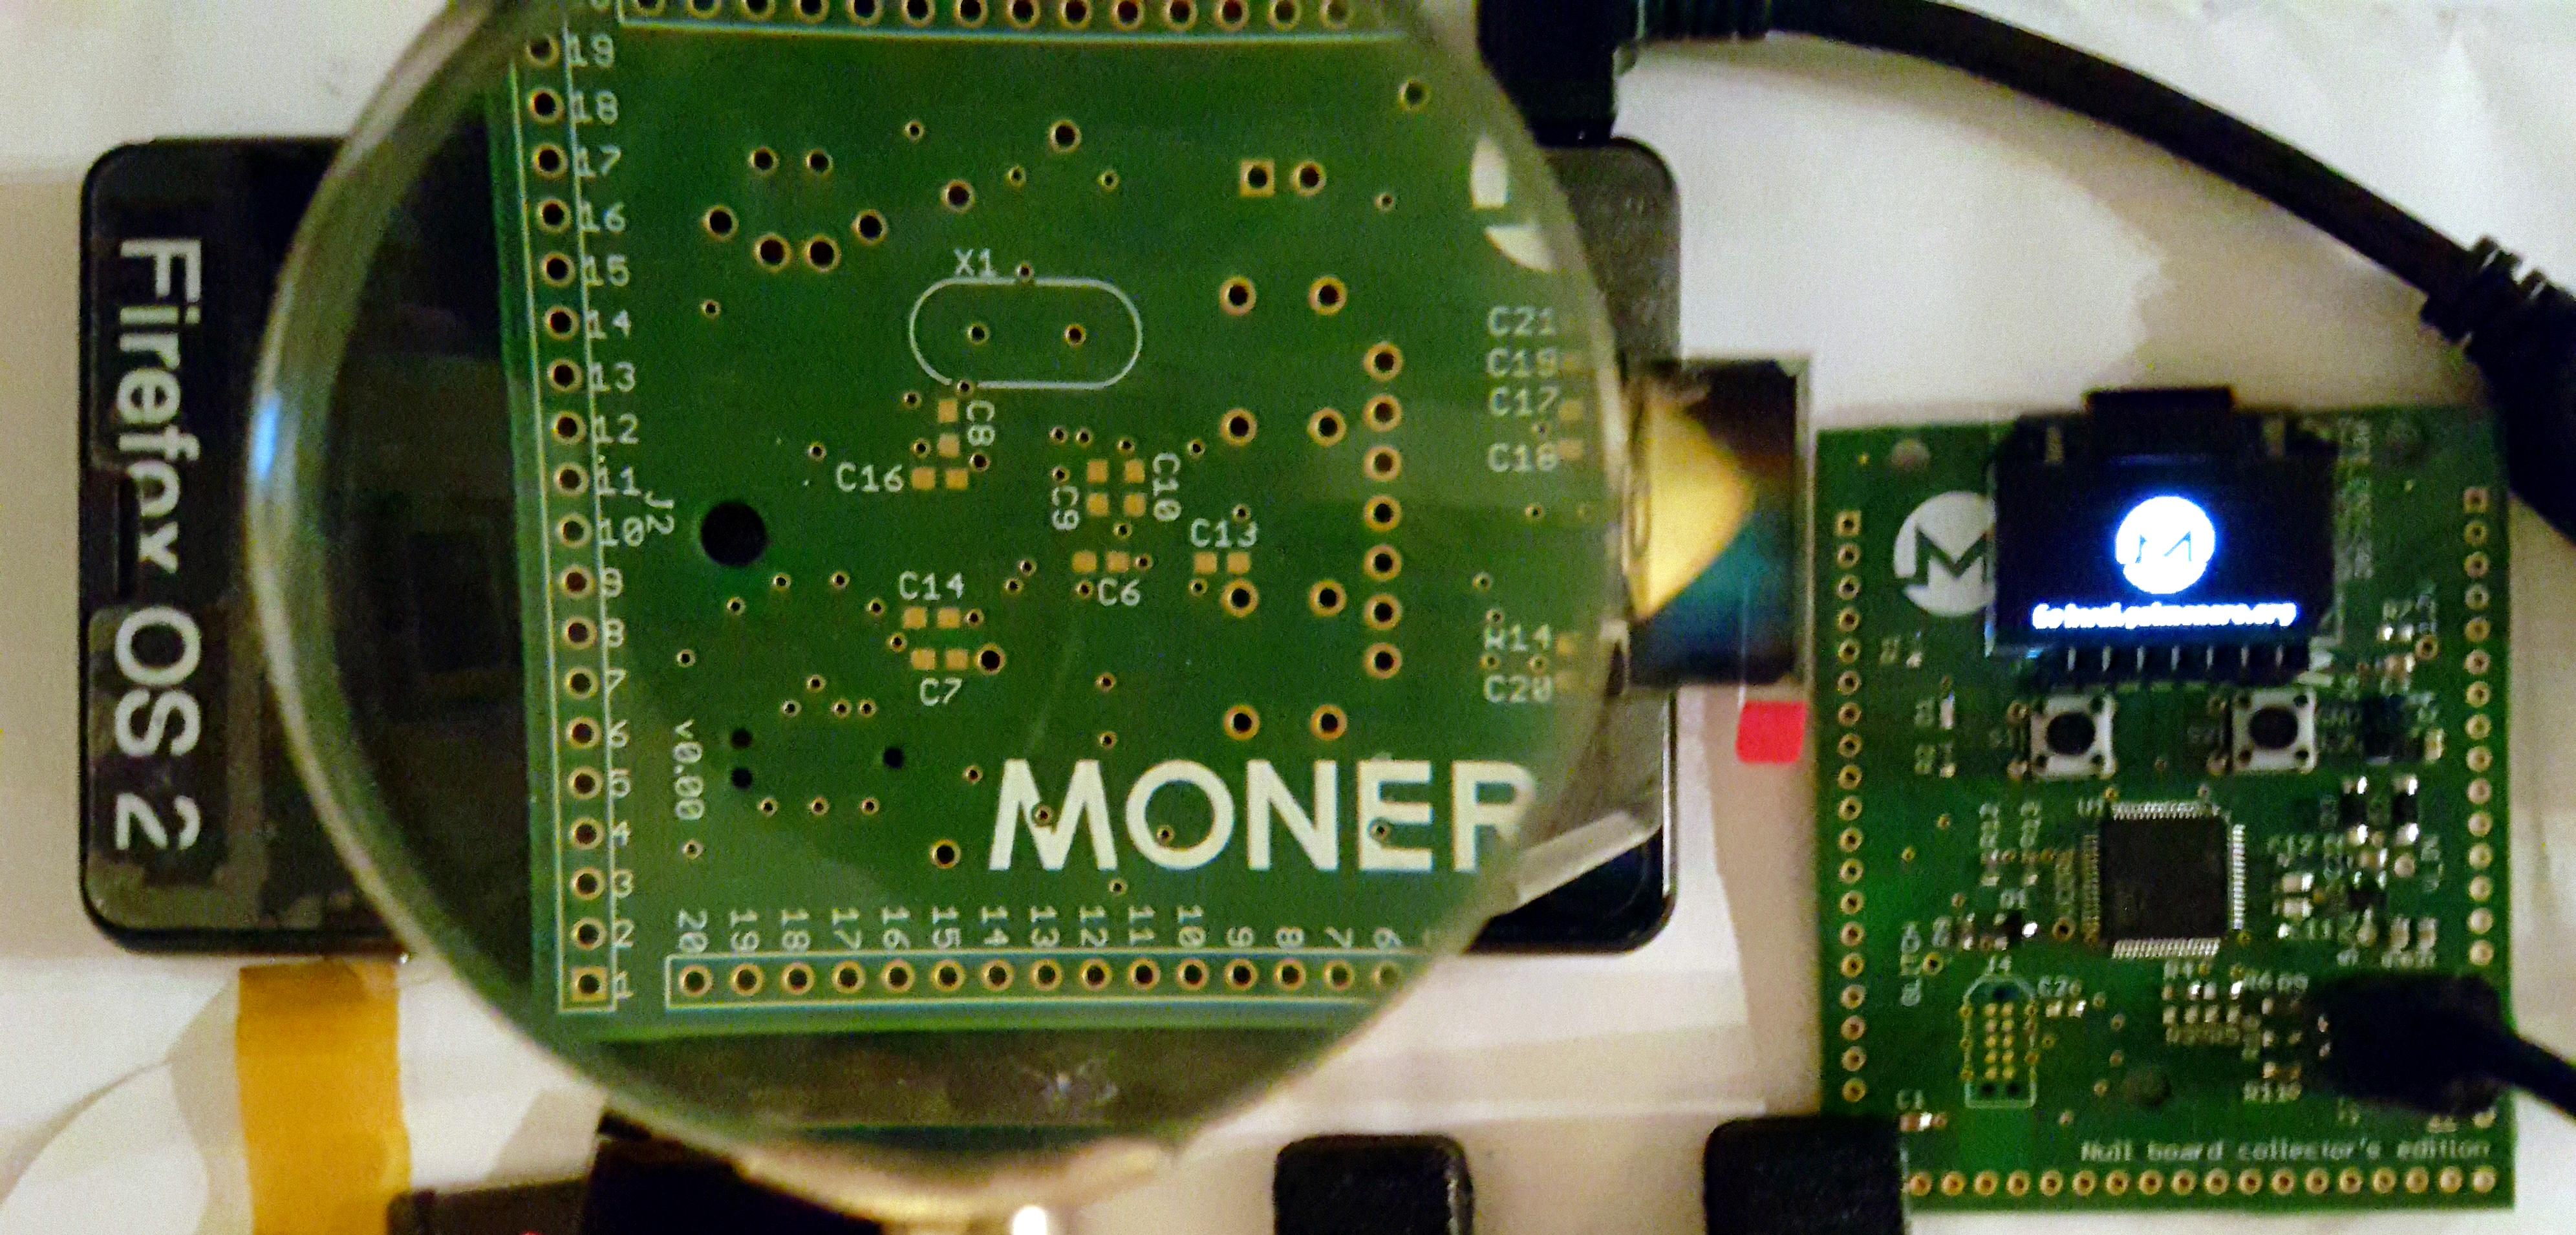 Monero's Hardware Wallet Project is Progressing